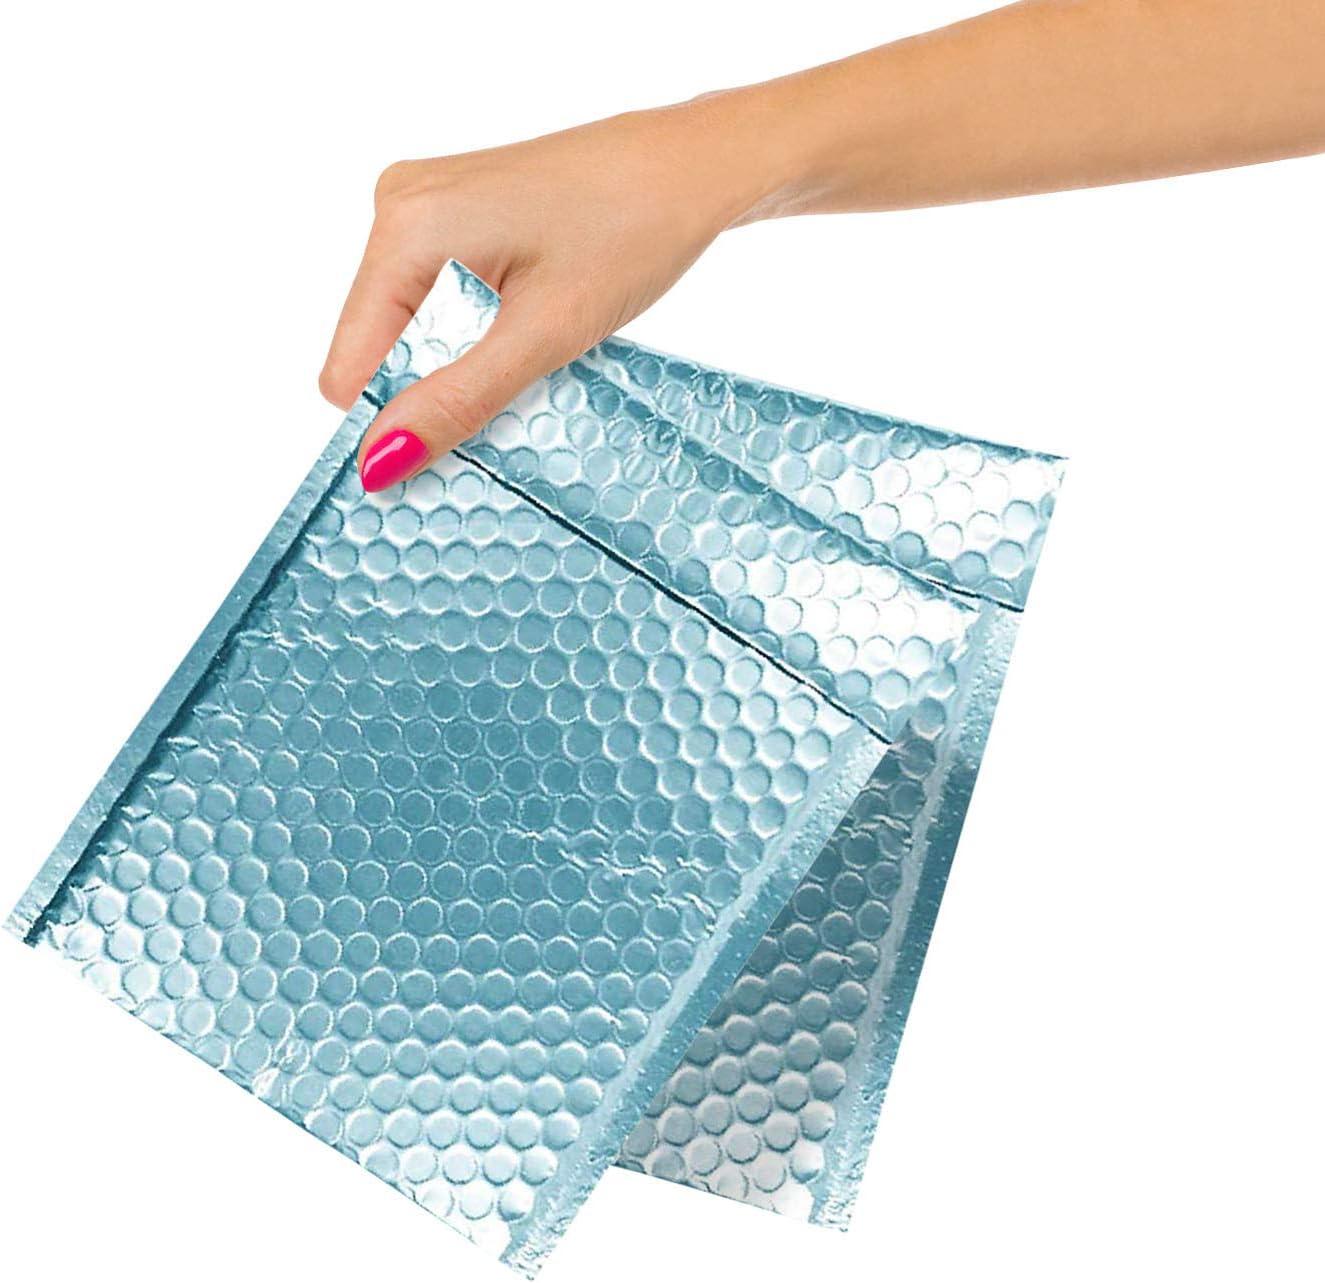 ABC 100 セールSALE%OFF Pack Ice Blue Metallic Bubble Mailers x Colo Matte 期間限定で特別価格 9 6.5